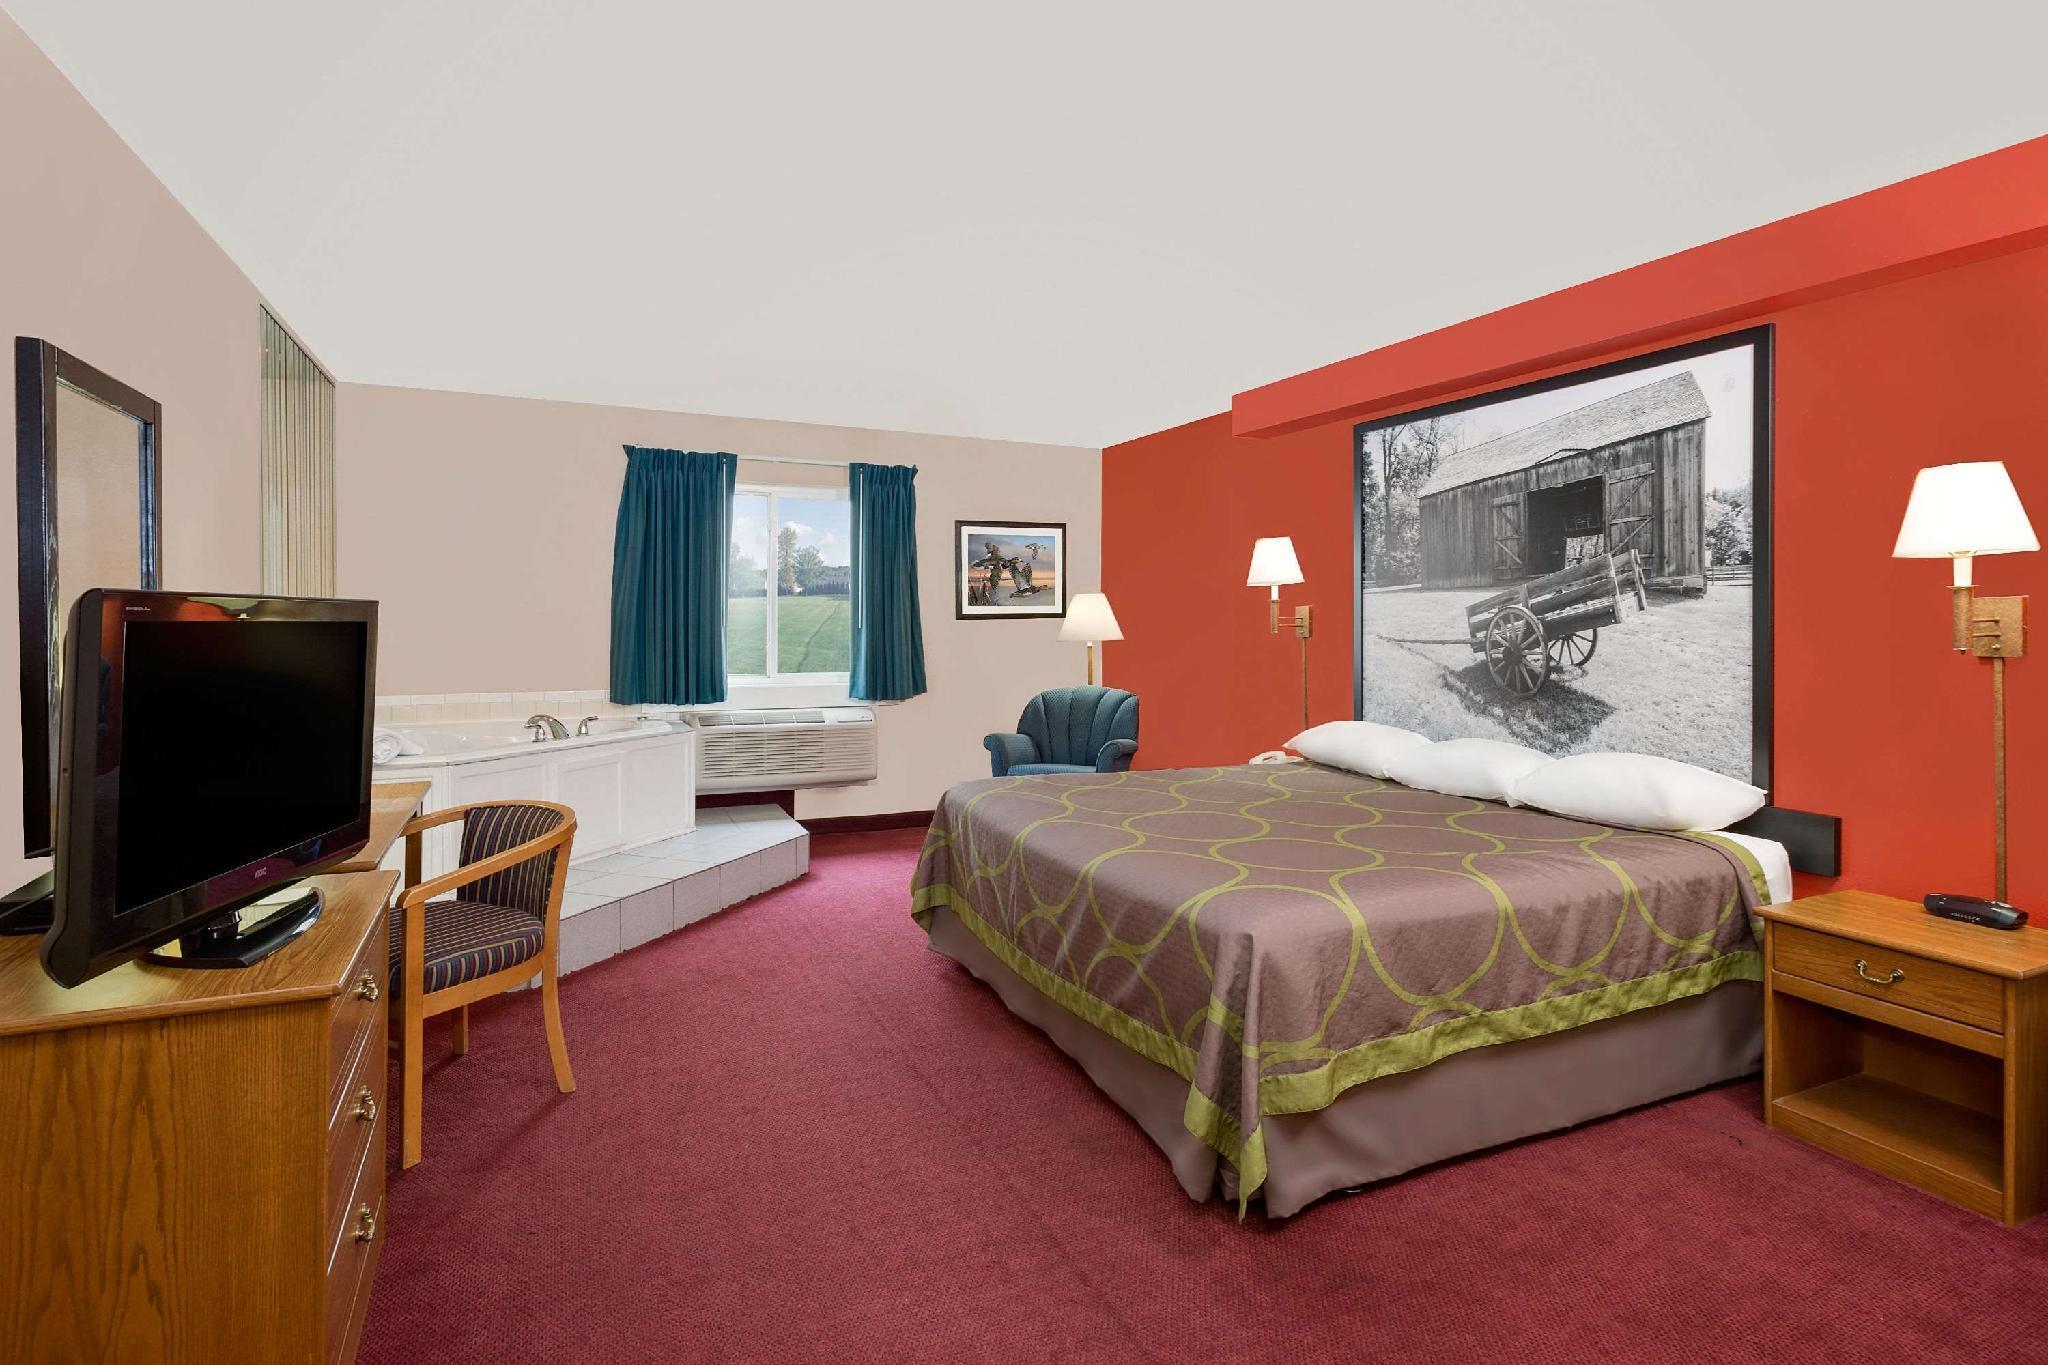 1 King Bed, Deluxe Studio Suite, Non-Smoking